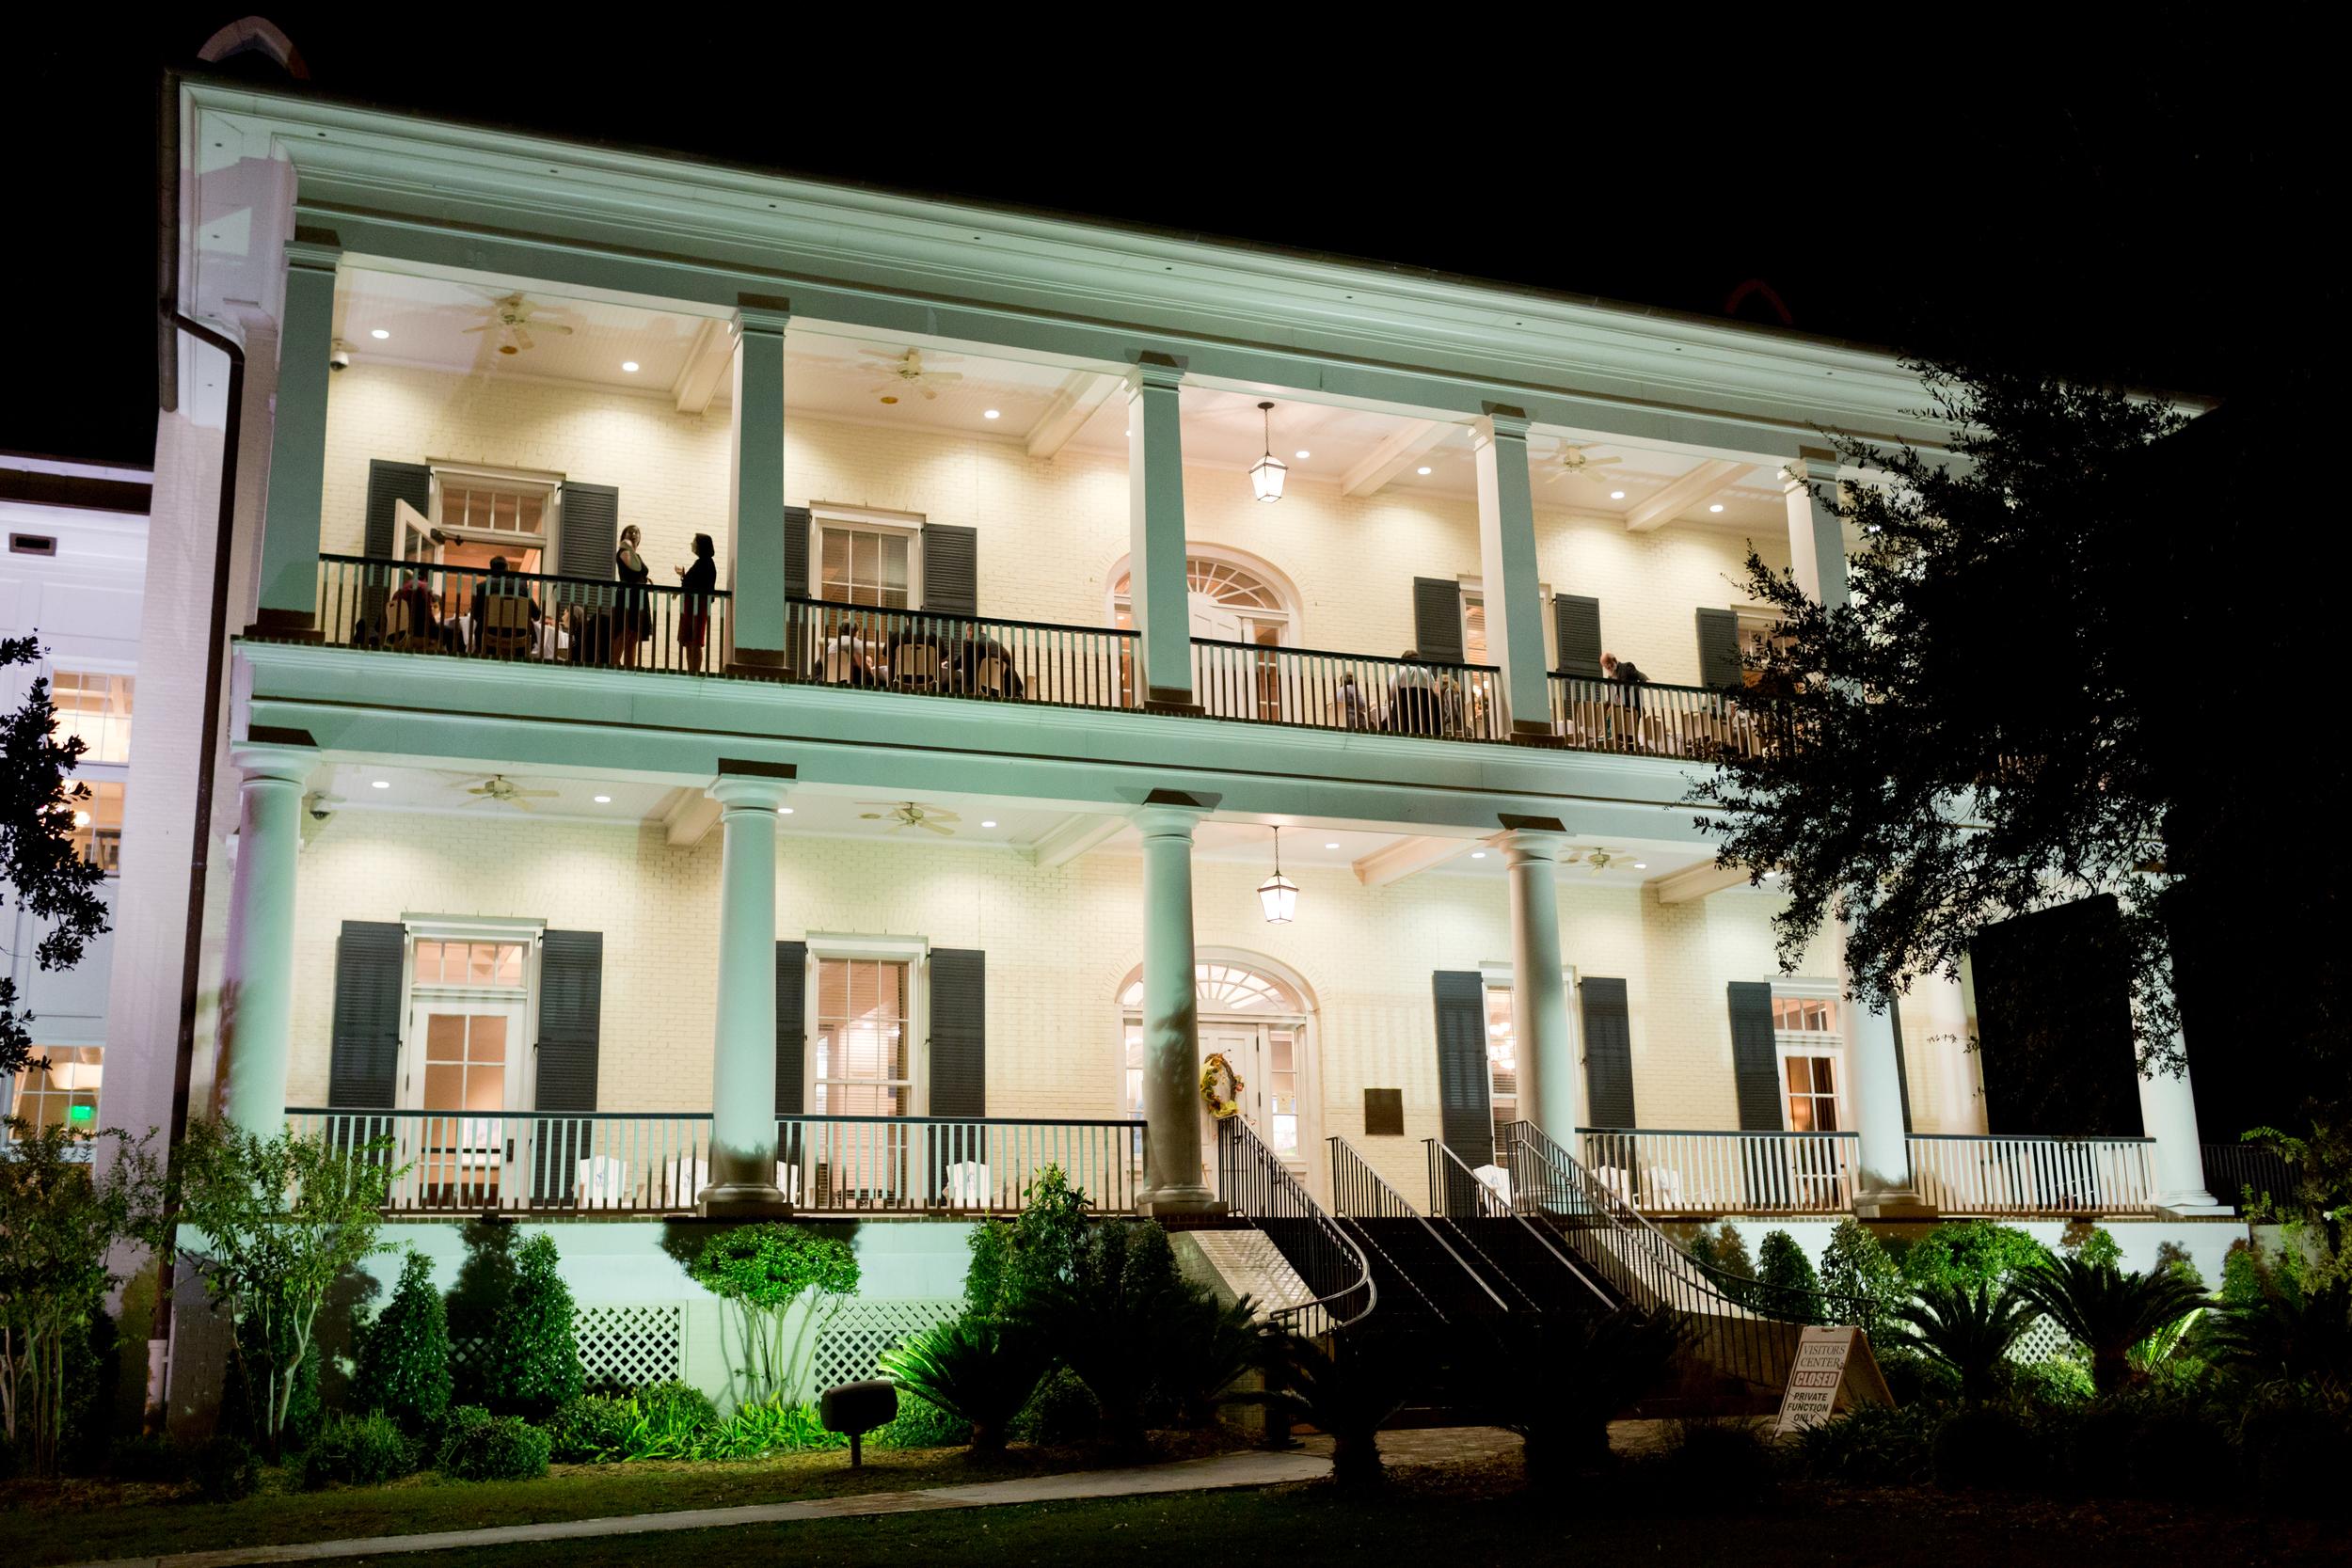 Biloxi Visitors Center at night (wedding venue)